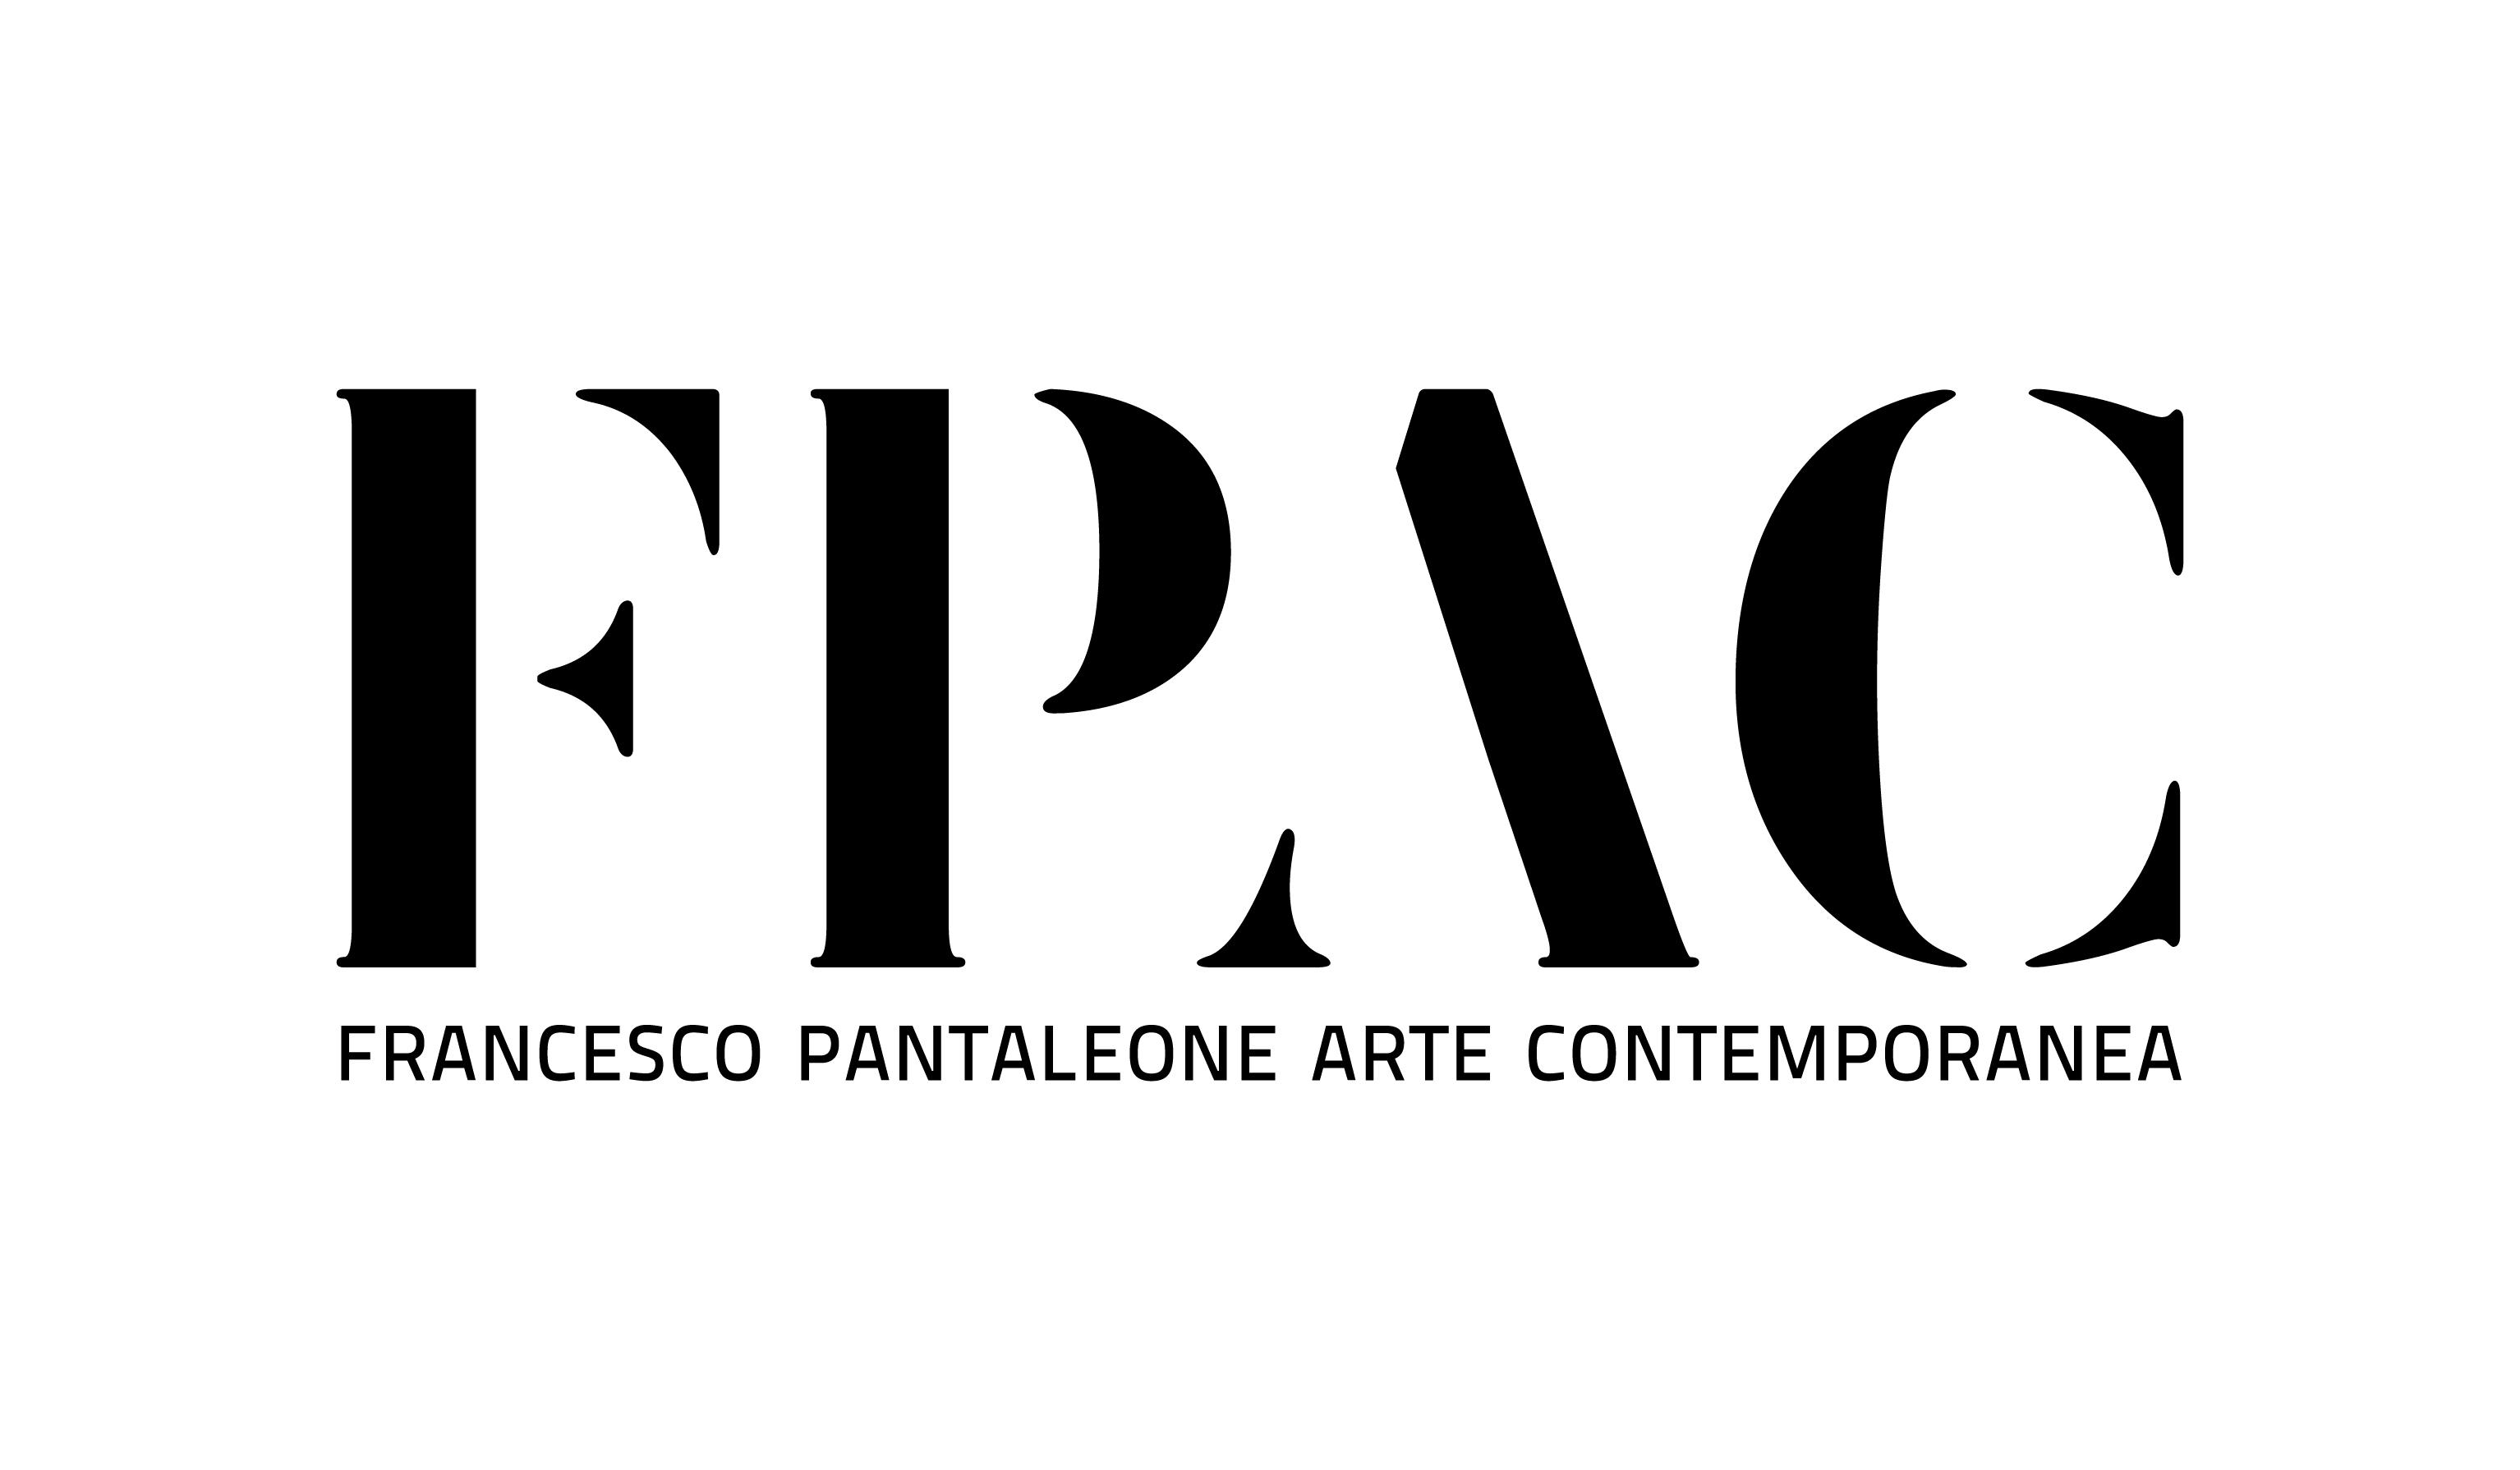 Francesco Pantaleone